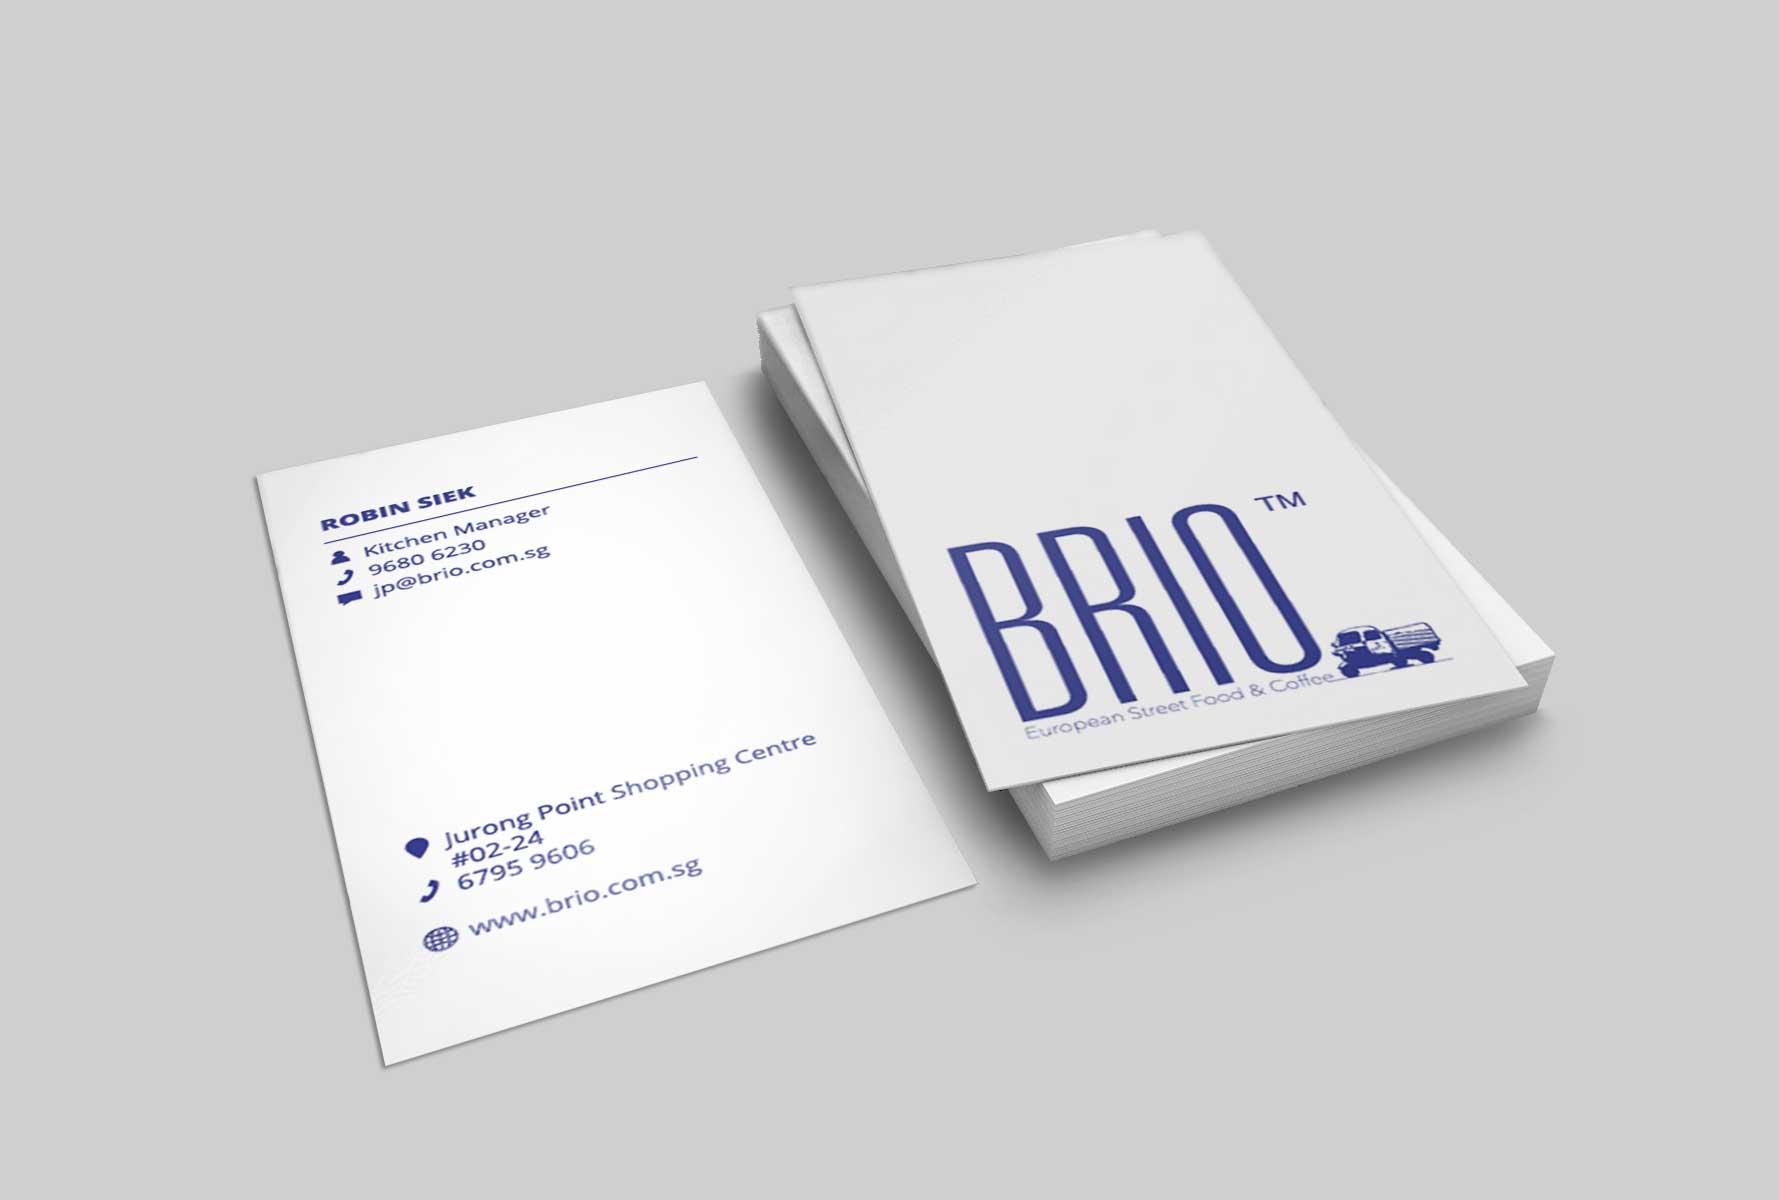 Brio-Biz-Card-PREVIEW.jpg